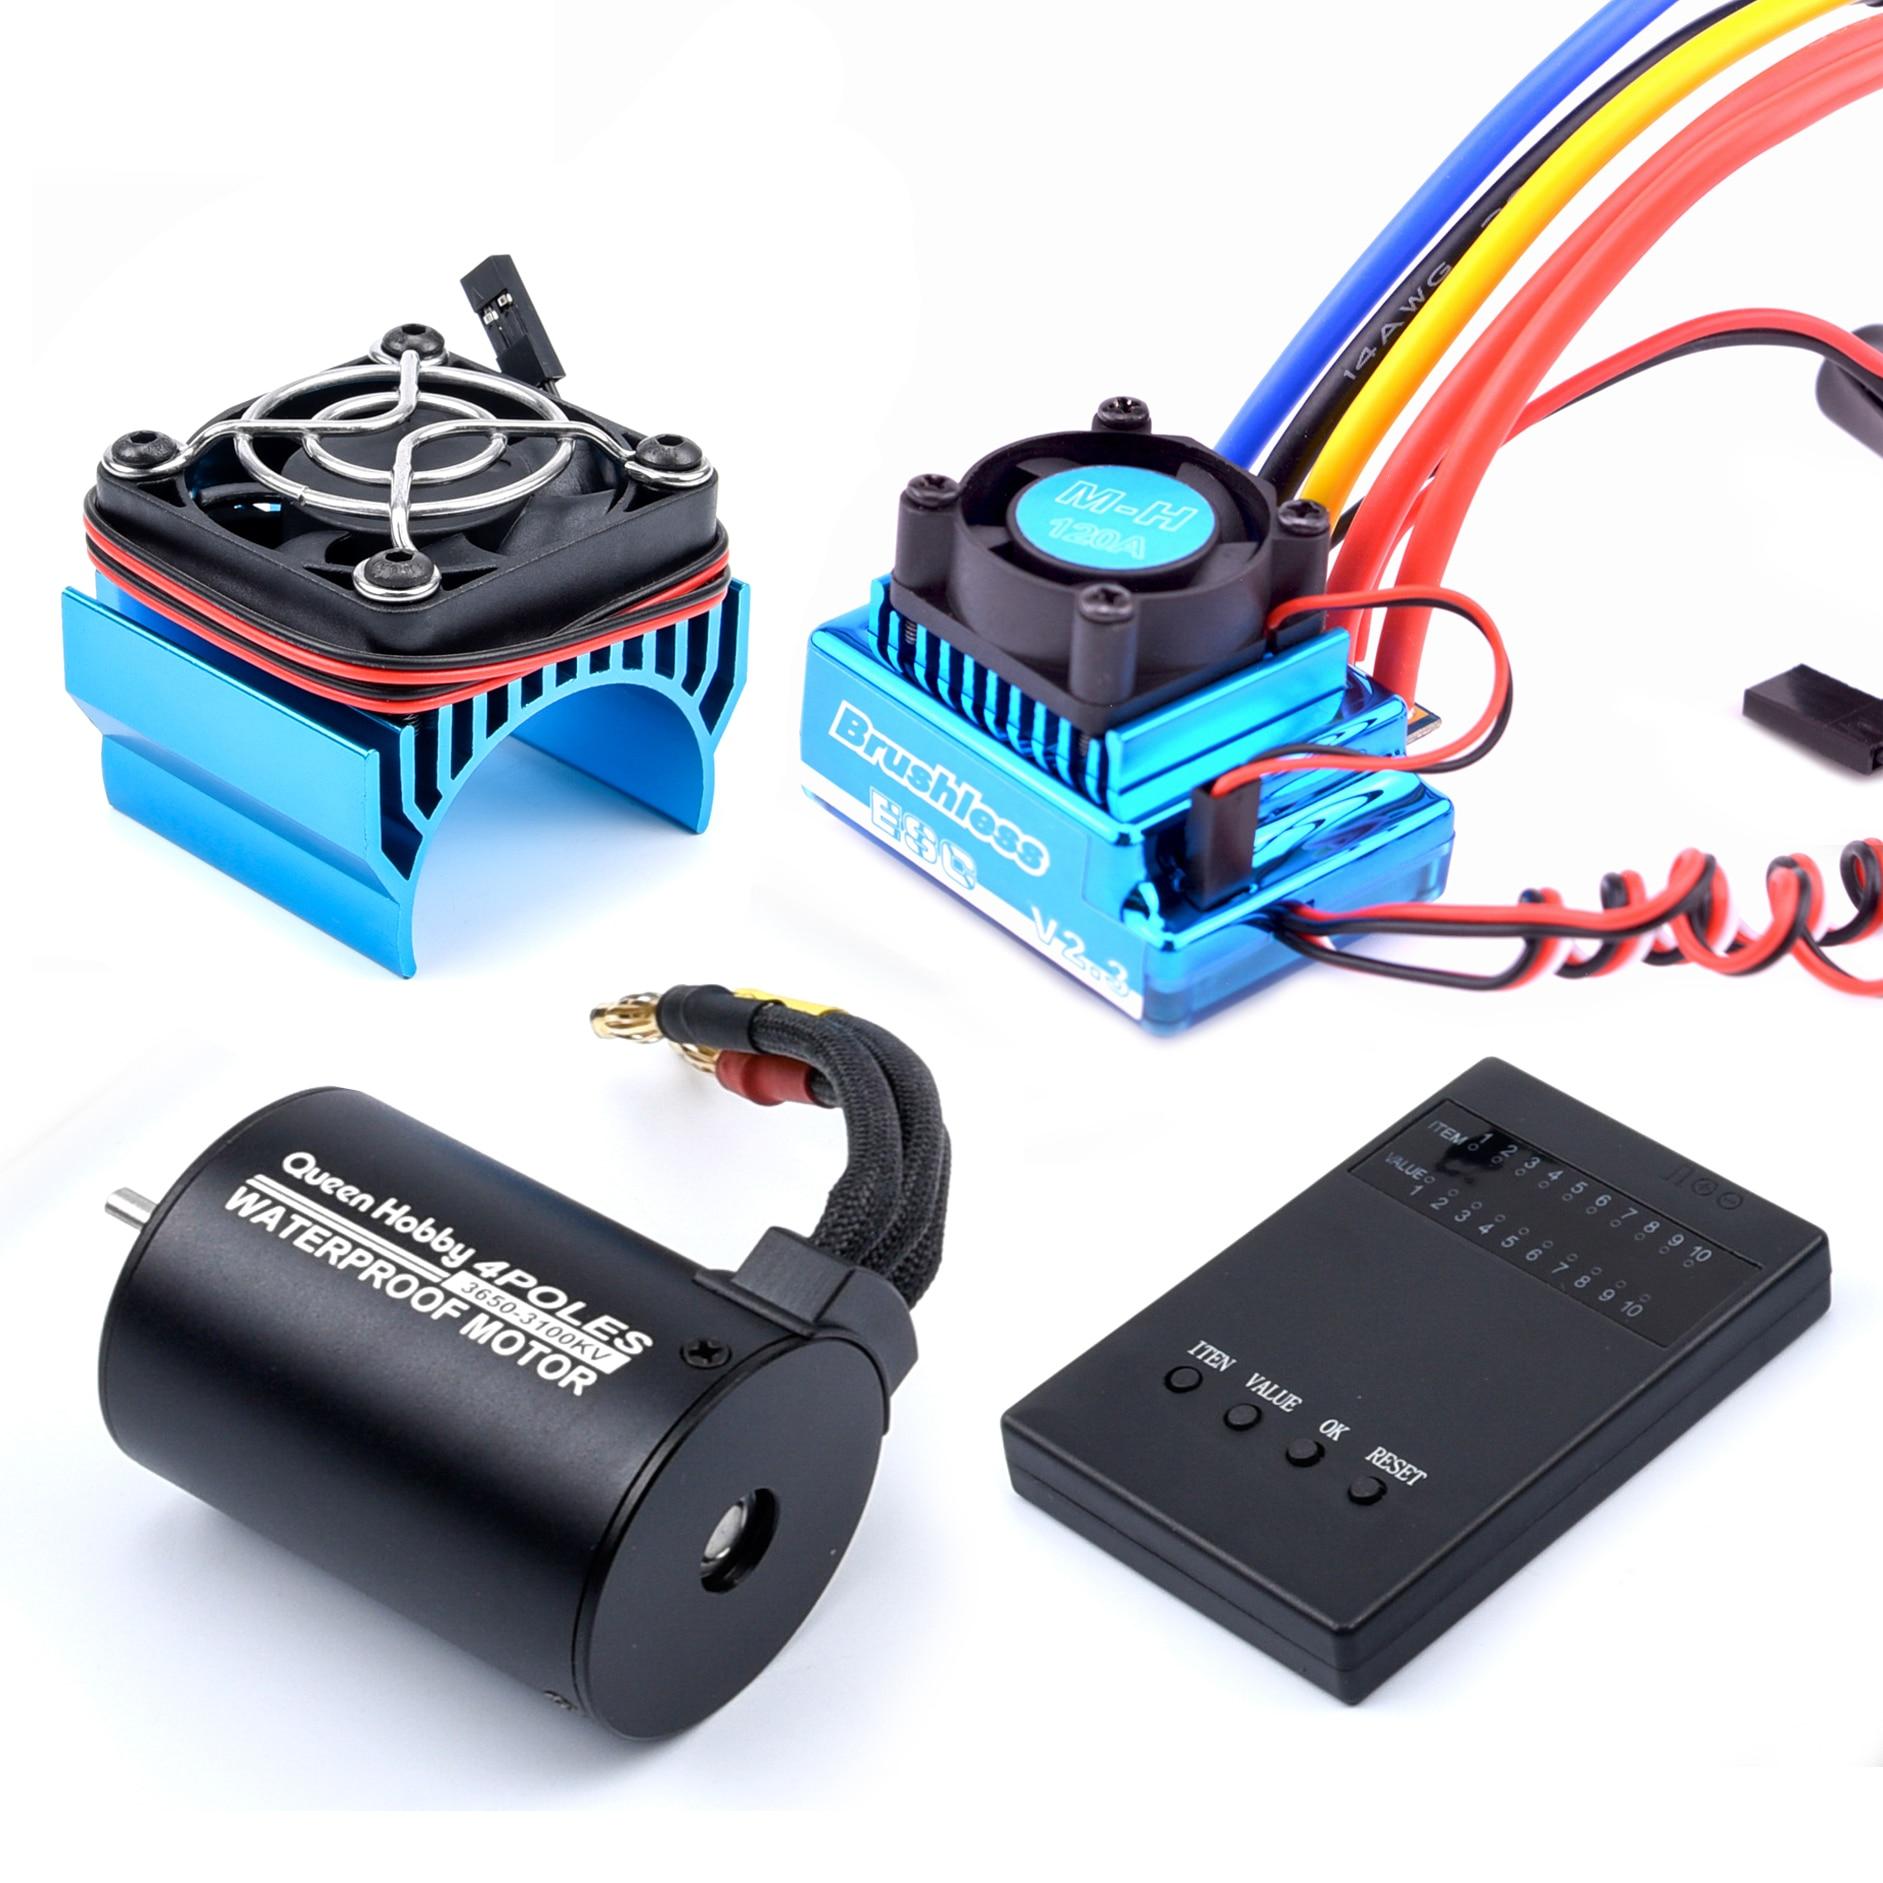 3650 2300KV / 3100KV / 3900KV / 4300KV / 5200KV Brushless Motor & 45A 60A 80A 120A ESC Combo for 1:1